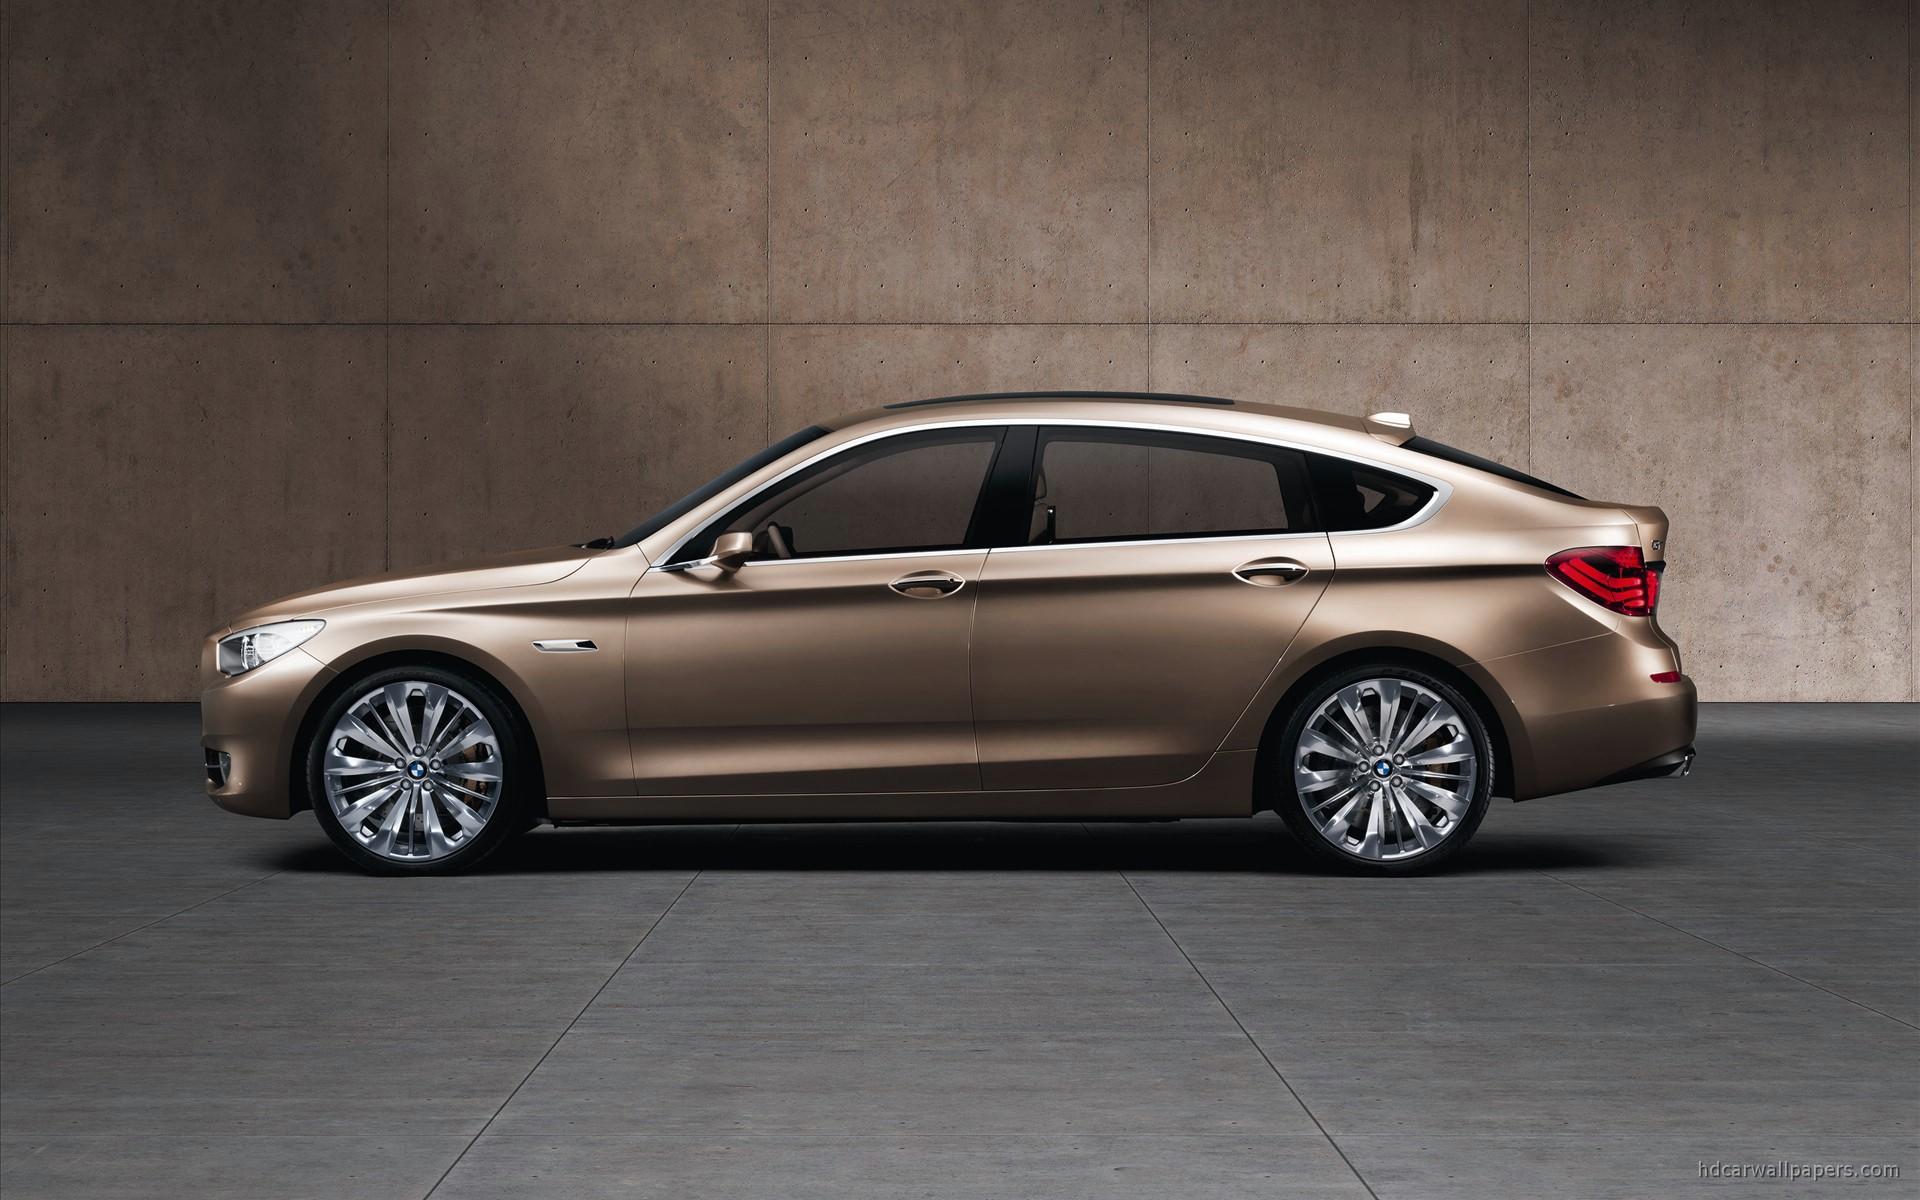 2009 BMW Concept 5 Series Gran Turismo 2 Wallpaper | HD ...